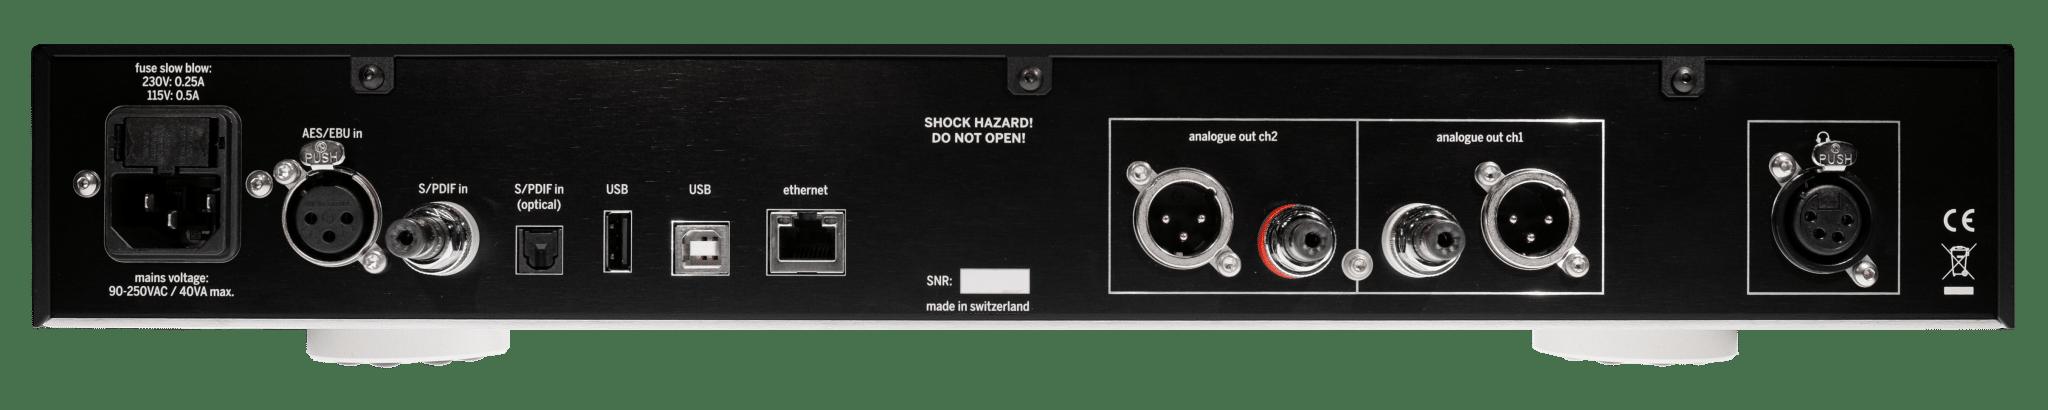 DAC502_Back